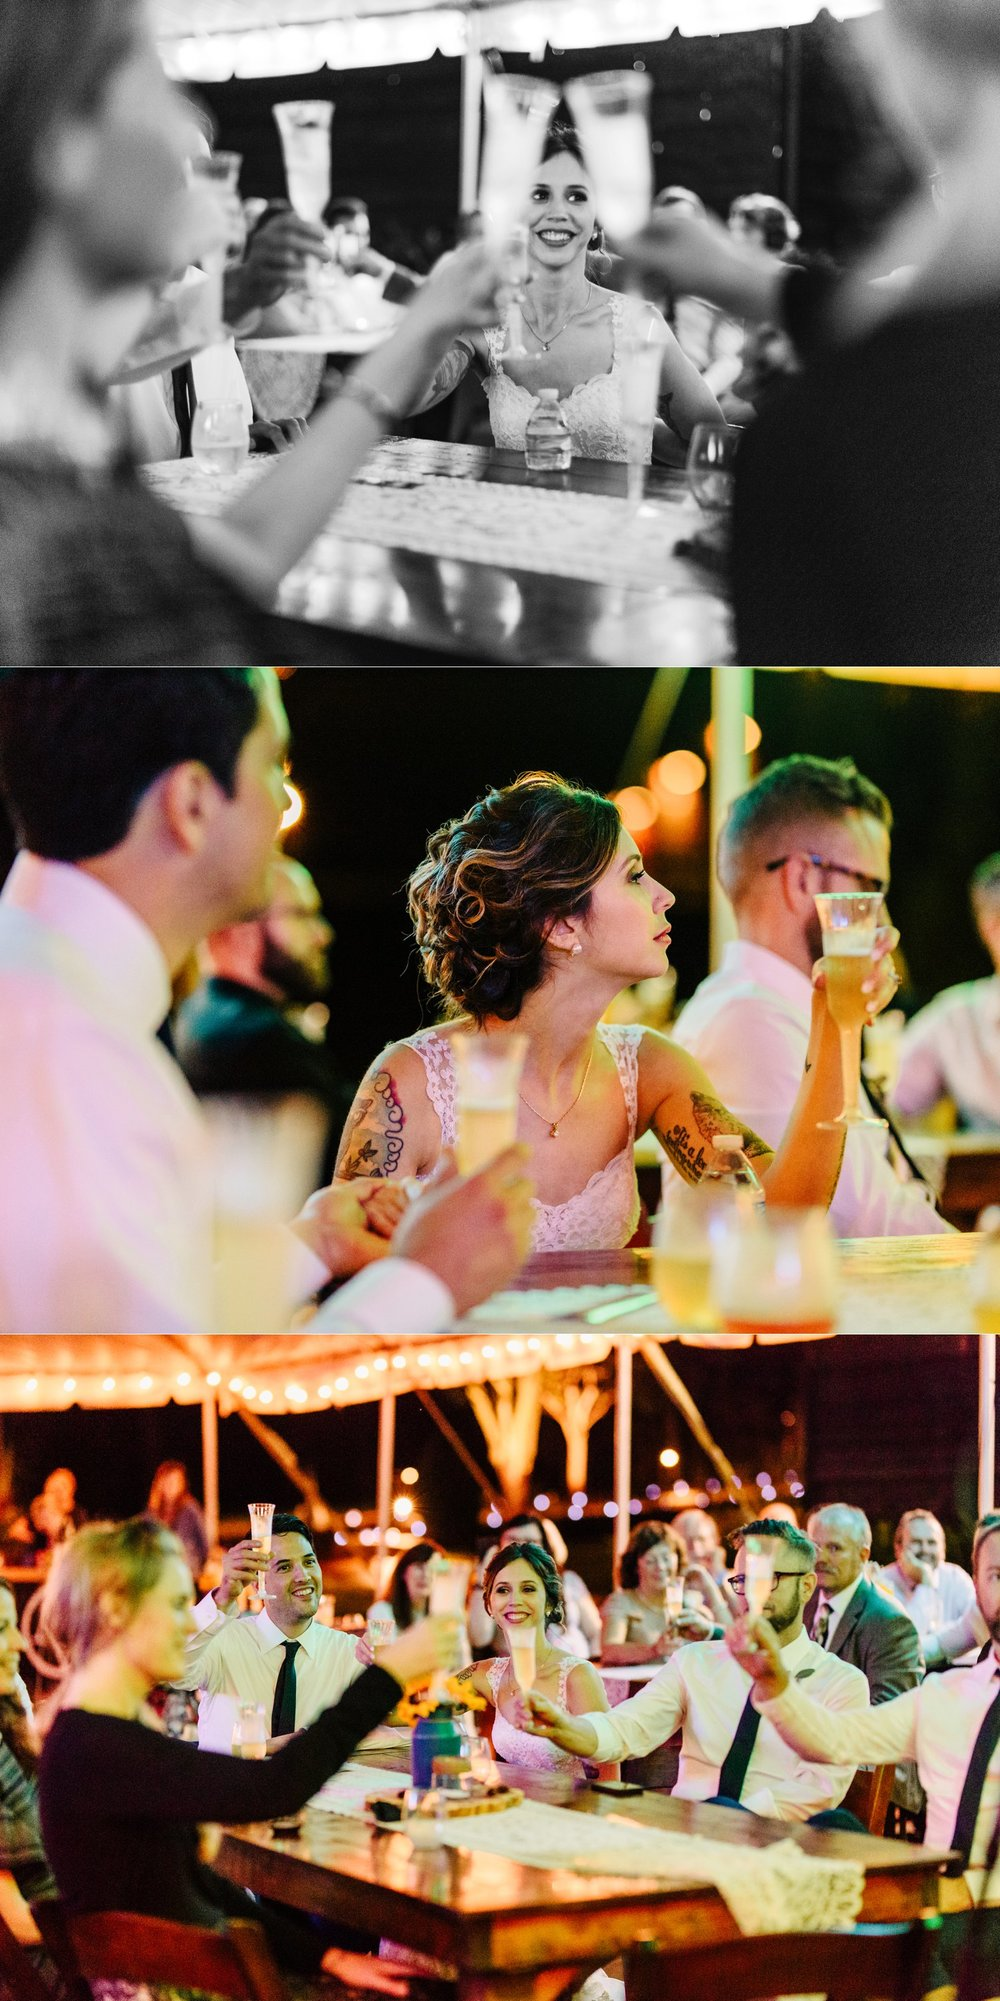 CK-Photo-arrington-wedding_0026.jpg